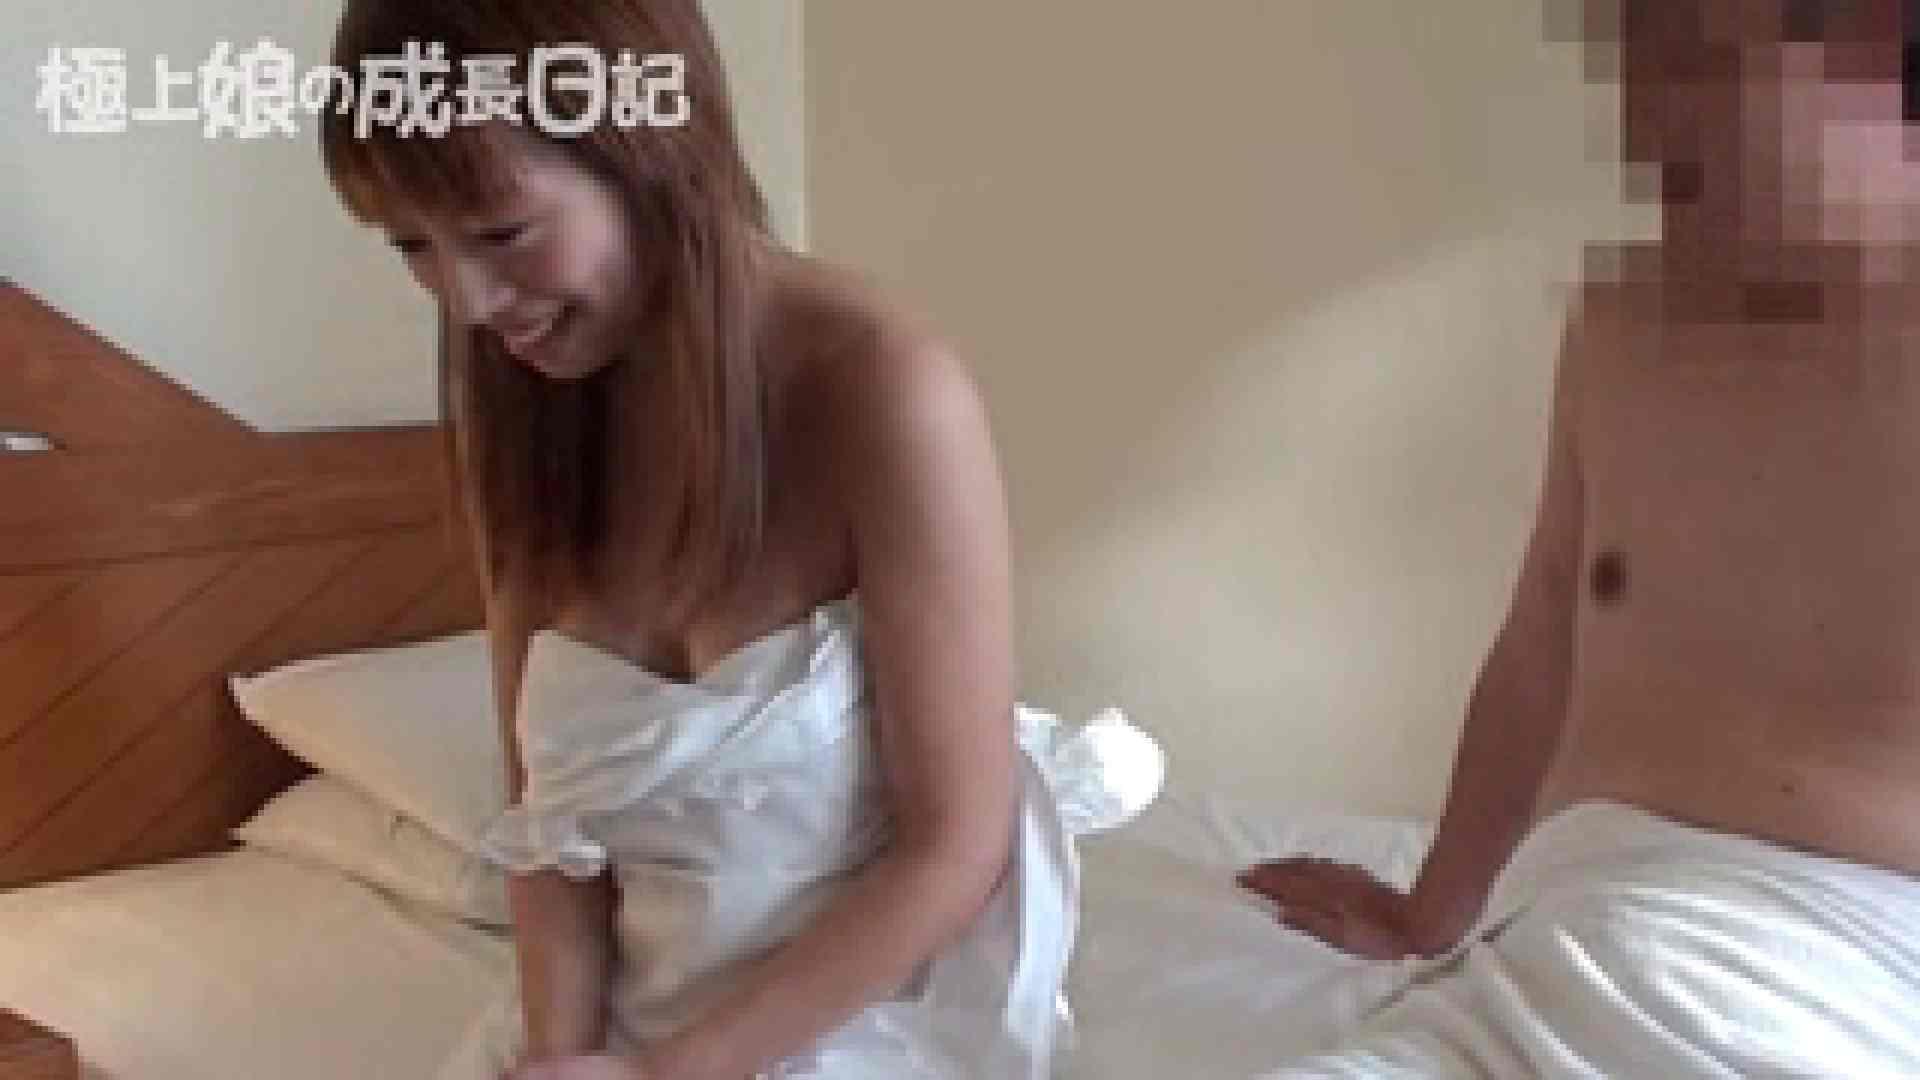 極上素人嬢の成長日記 3日目 素人ギャル女 | 友人投稿  100連発 15